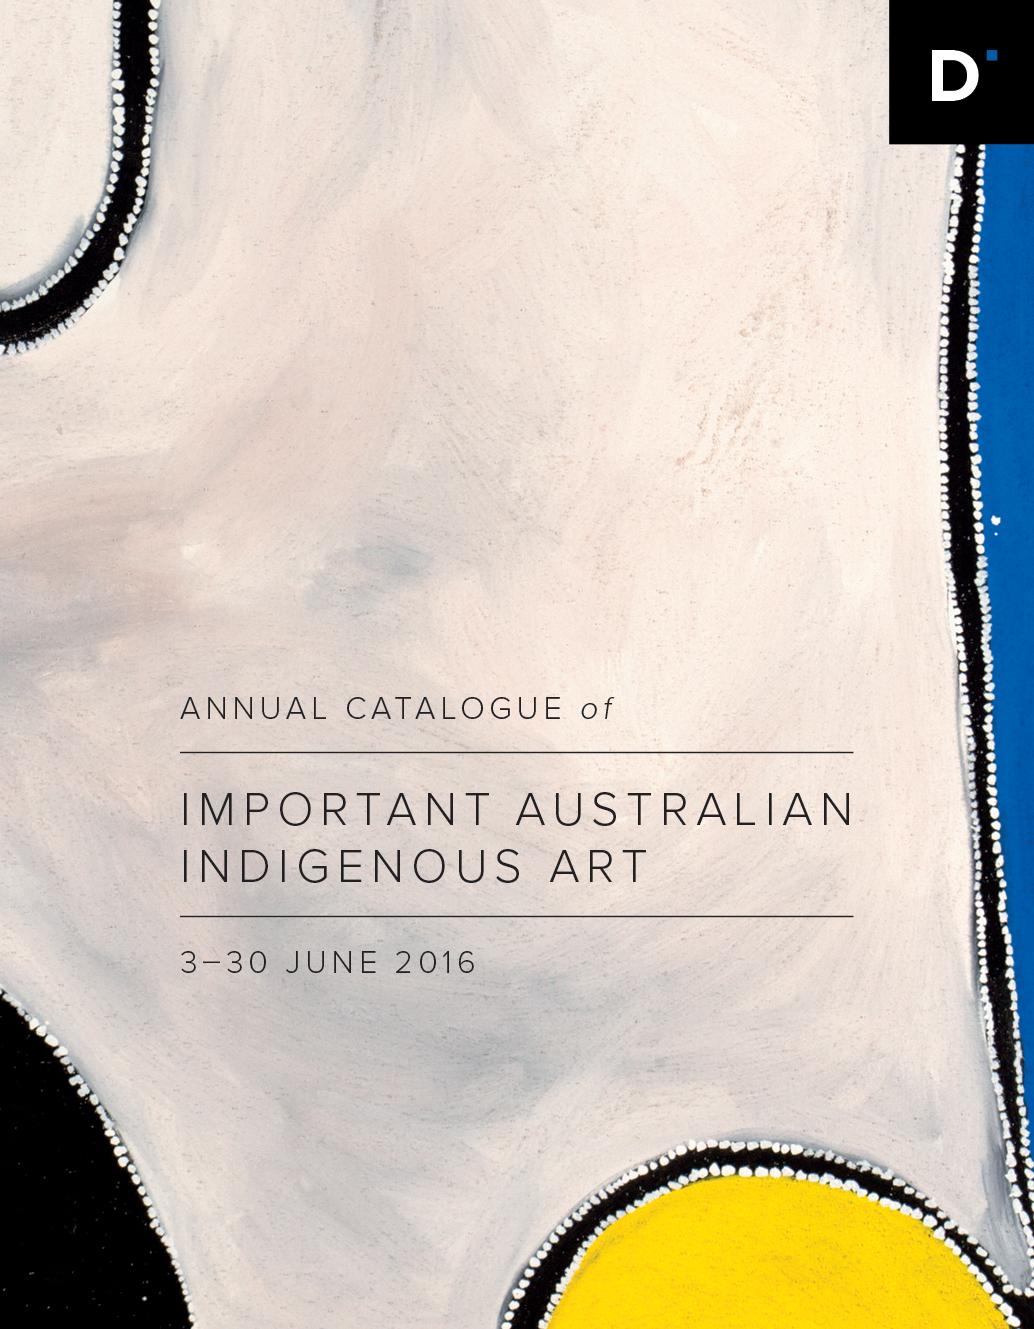 Australian Indigenous Art Exhibition 2016